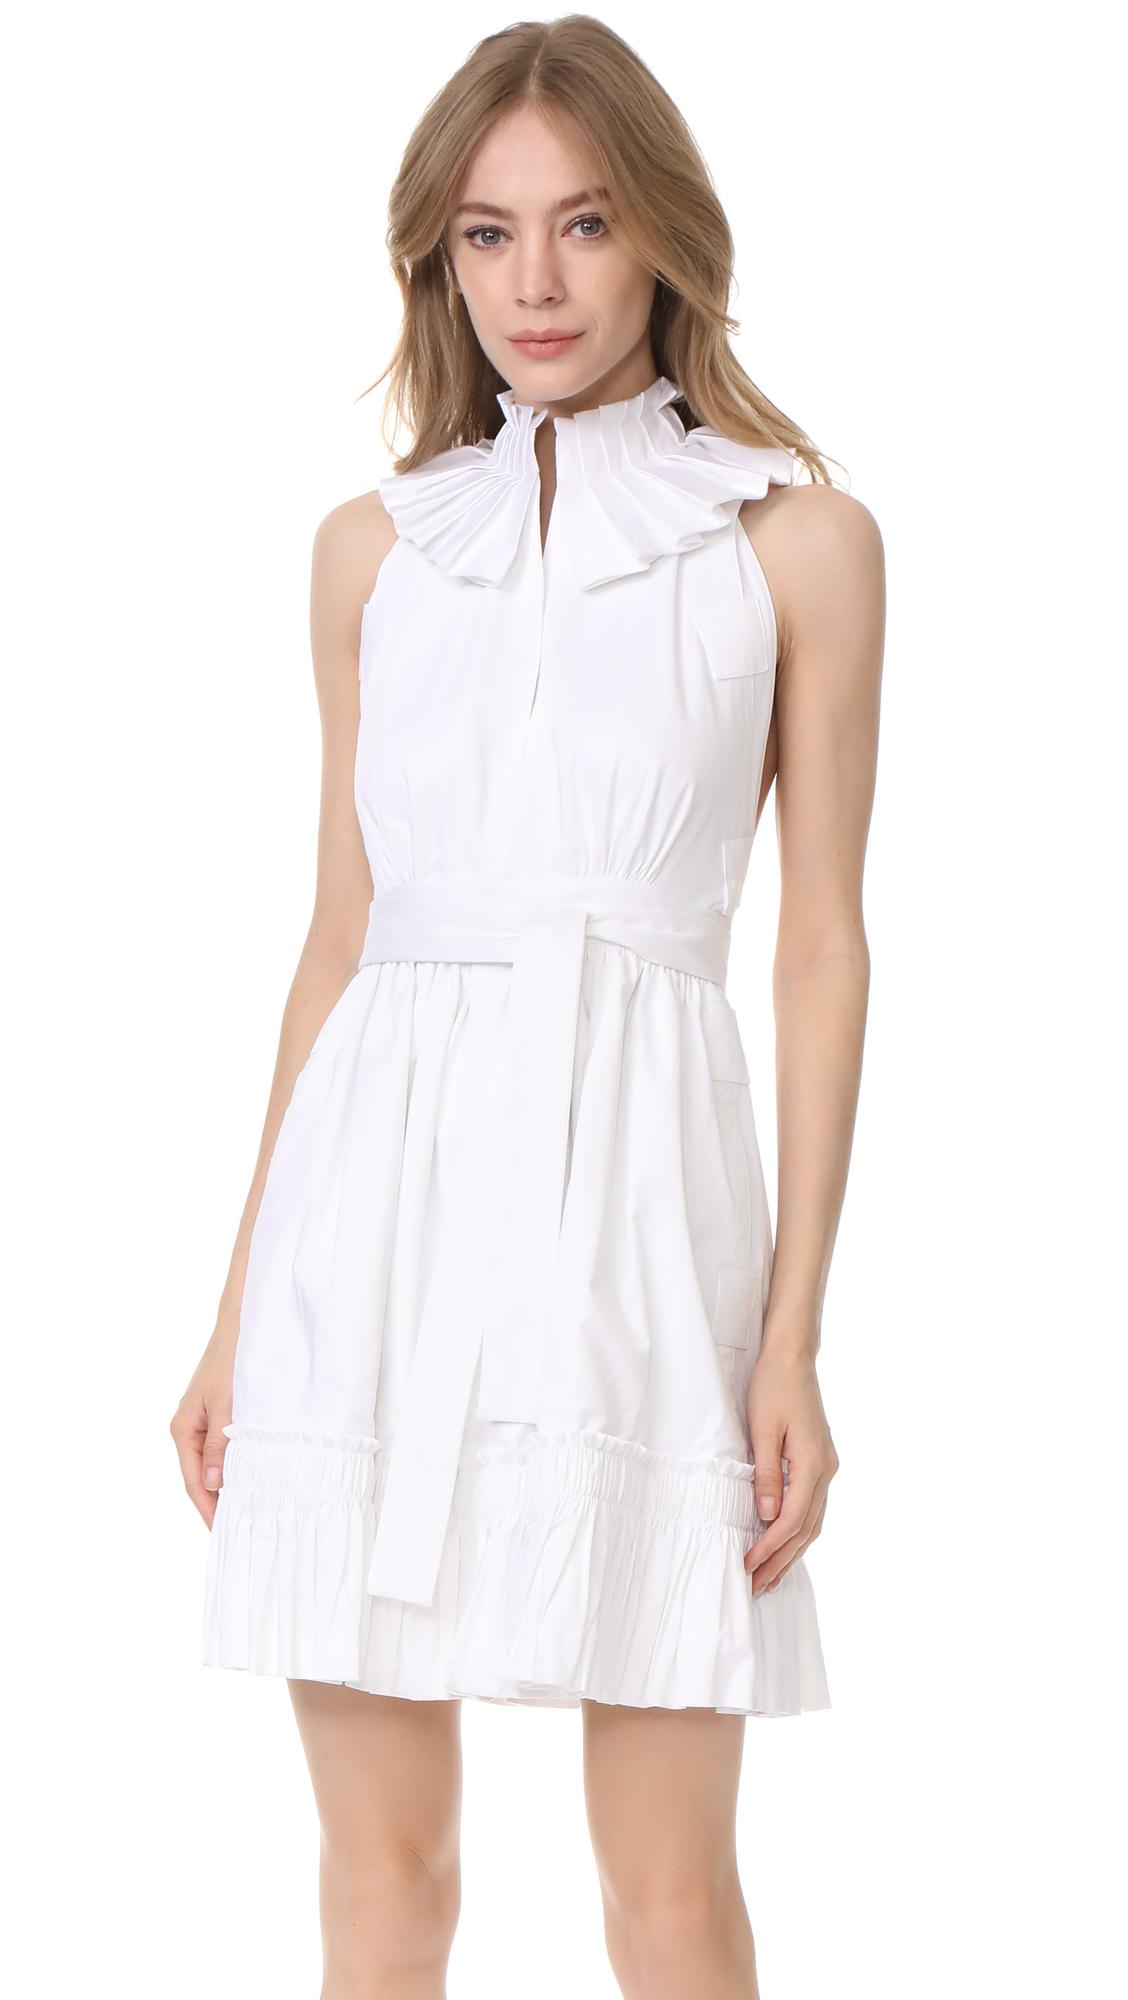 Alexis Briley Dress - White